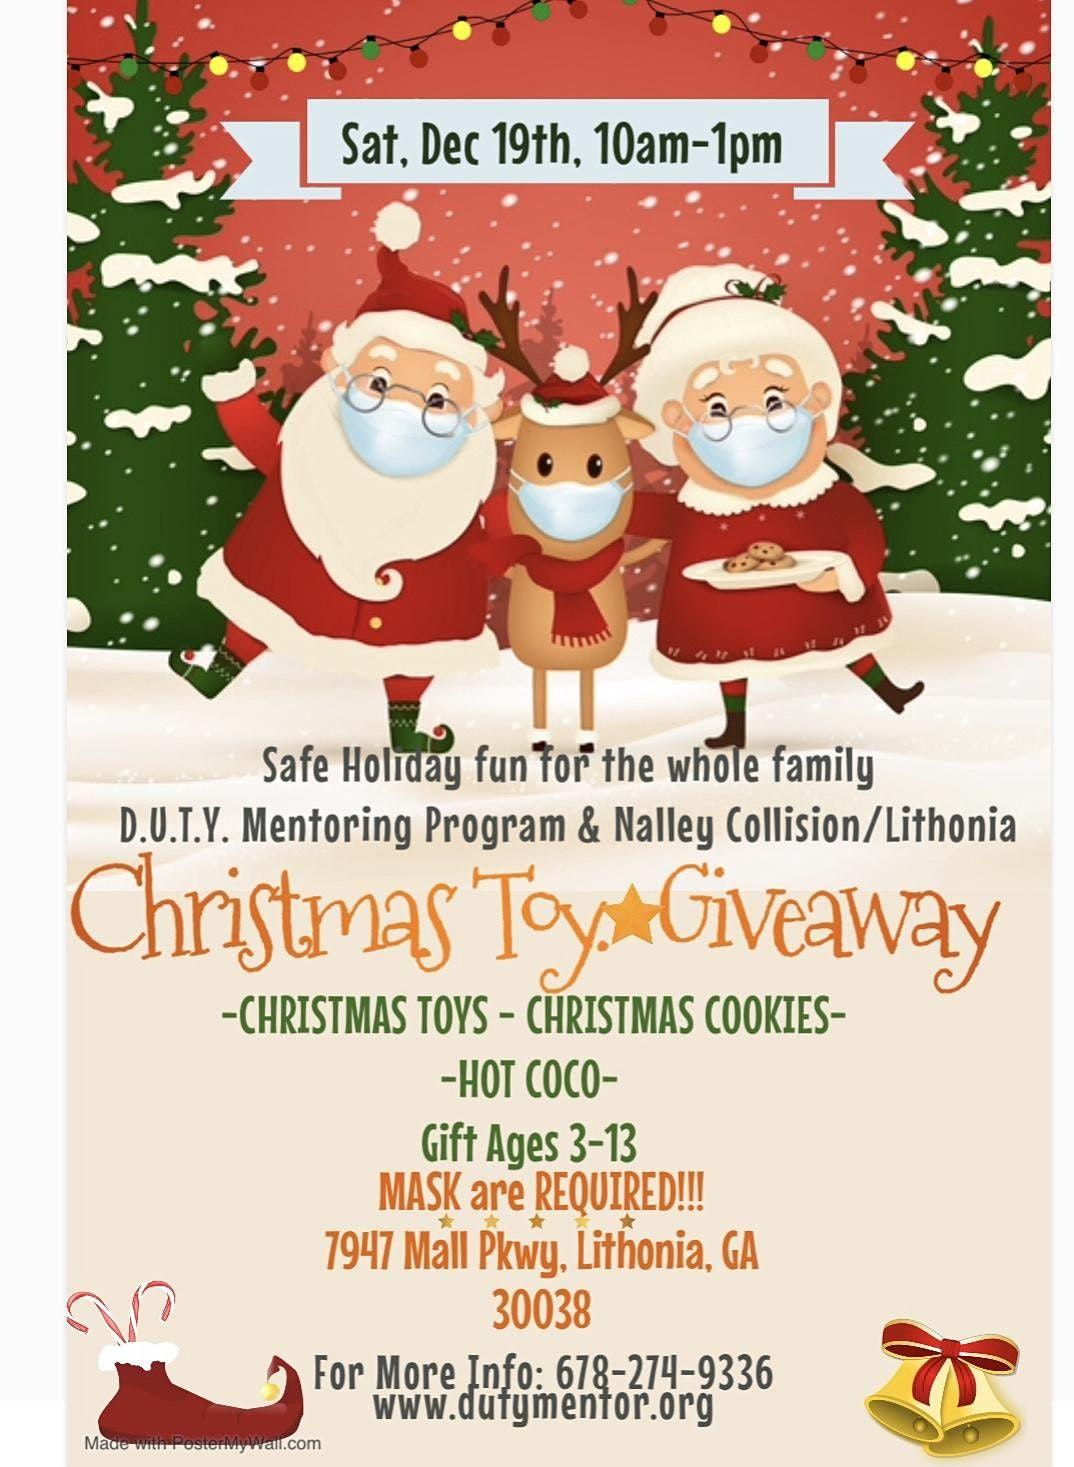 Christmas Toy Giveaway 2021 Christmas Toy Giveaway Nalley Collision Center Lithonia Stonecrest December 19 2021 Allevents In